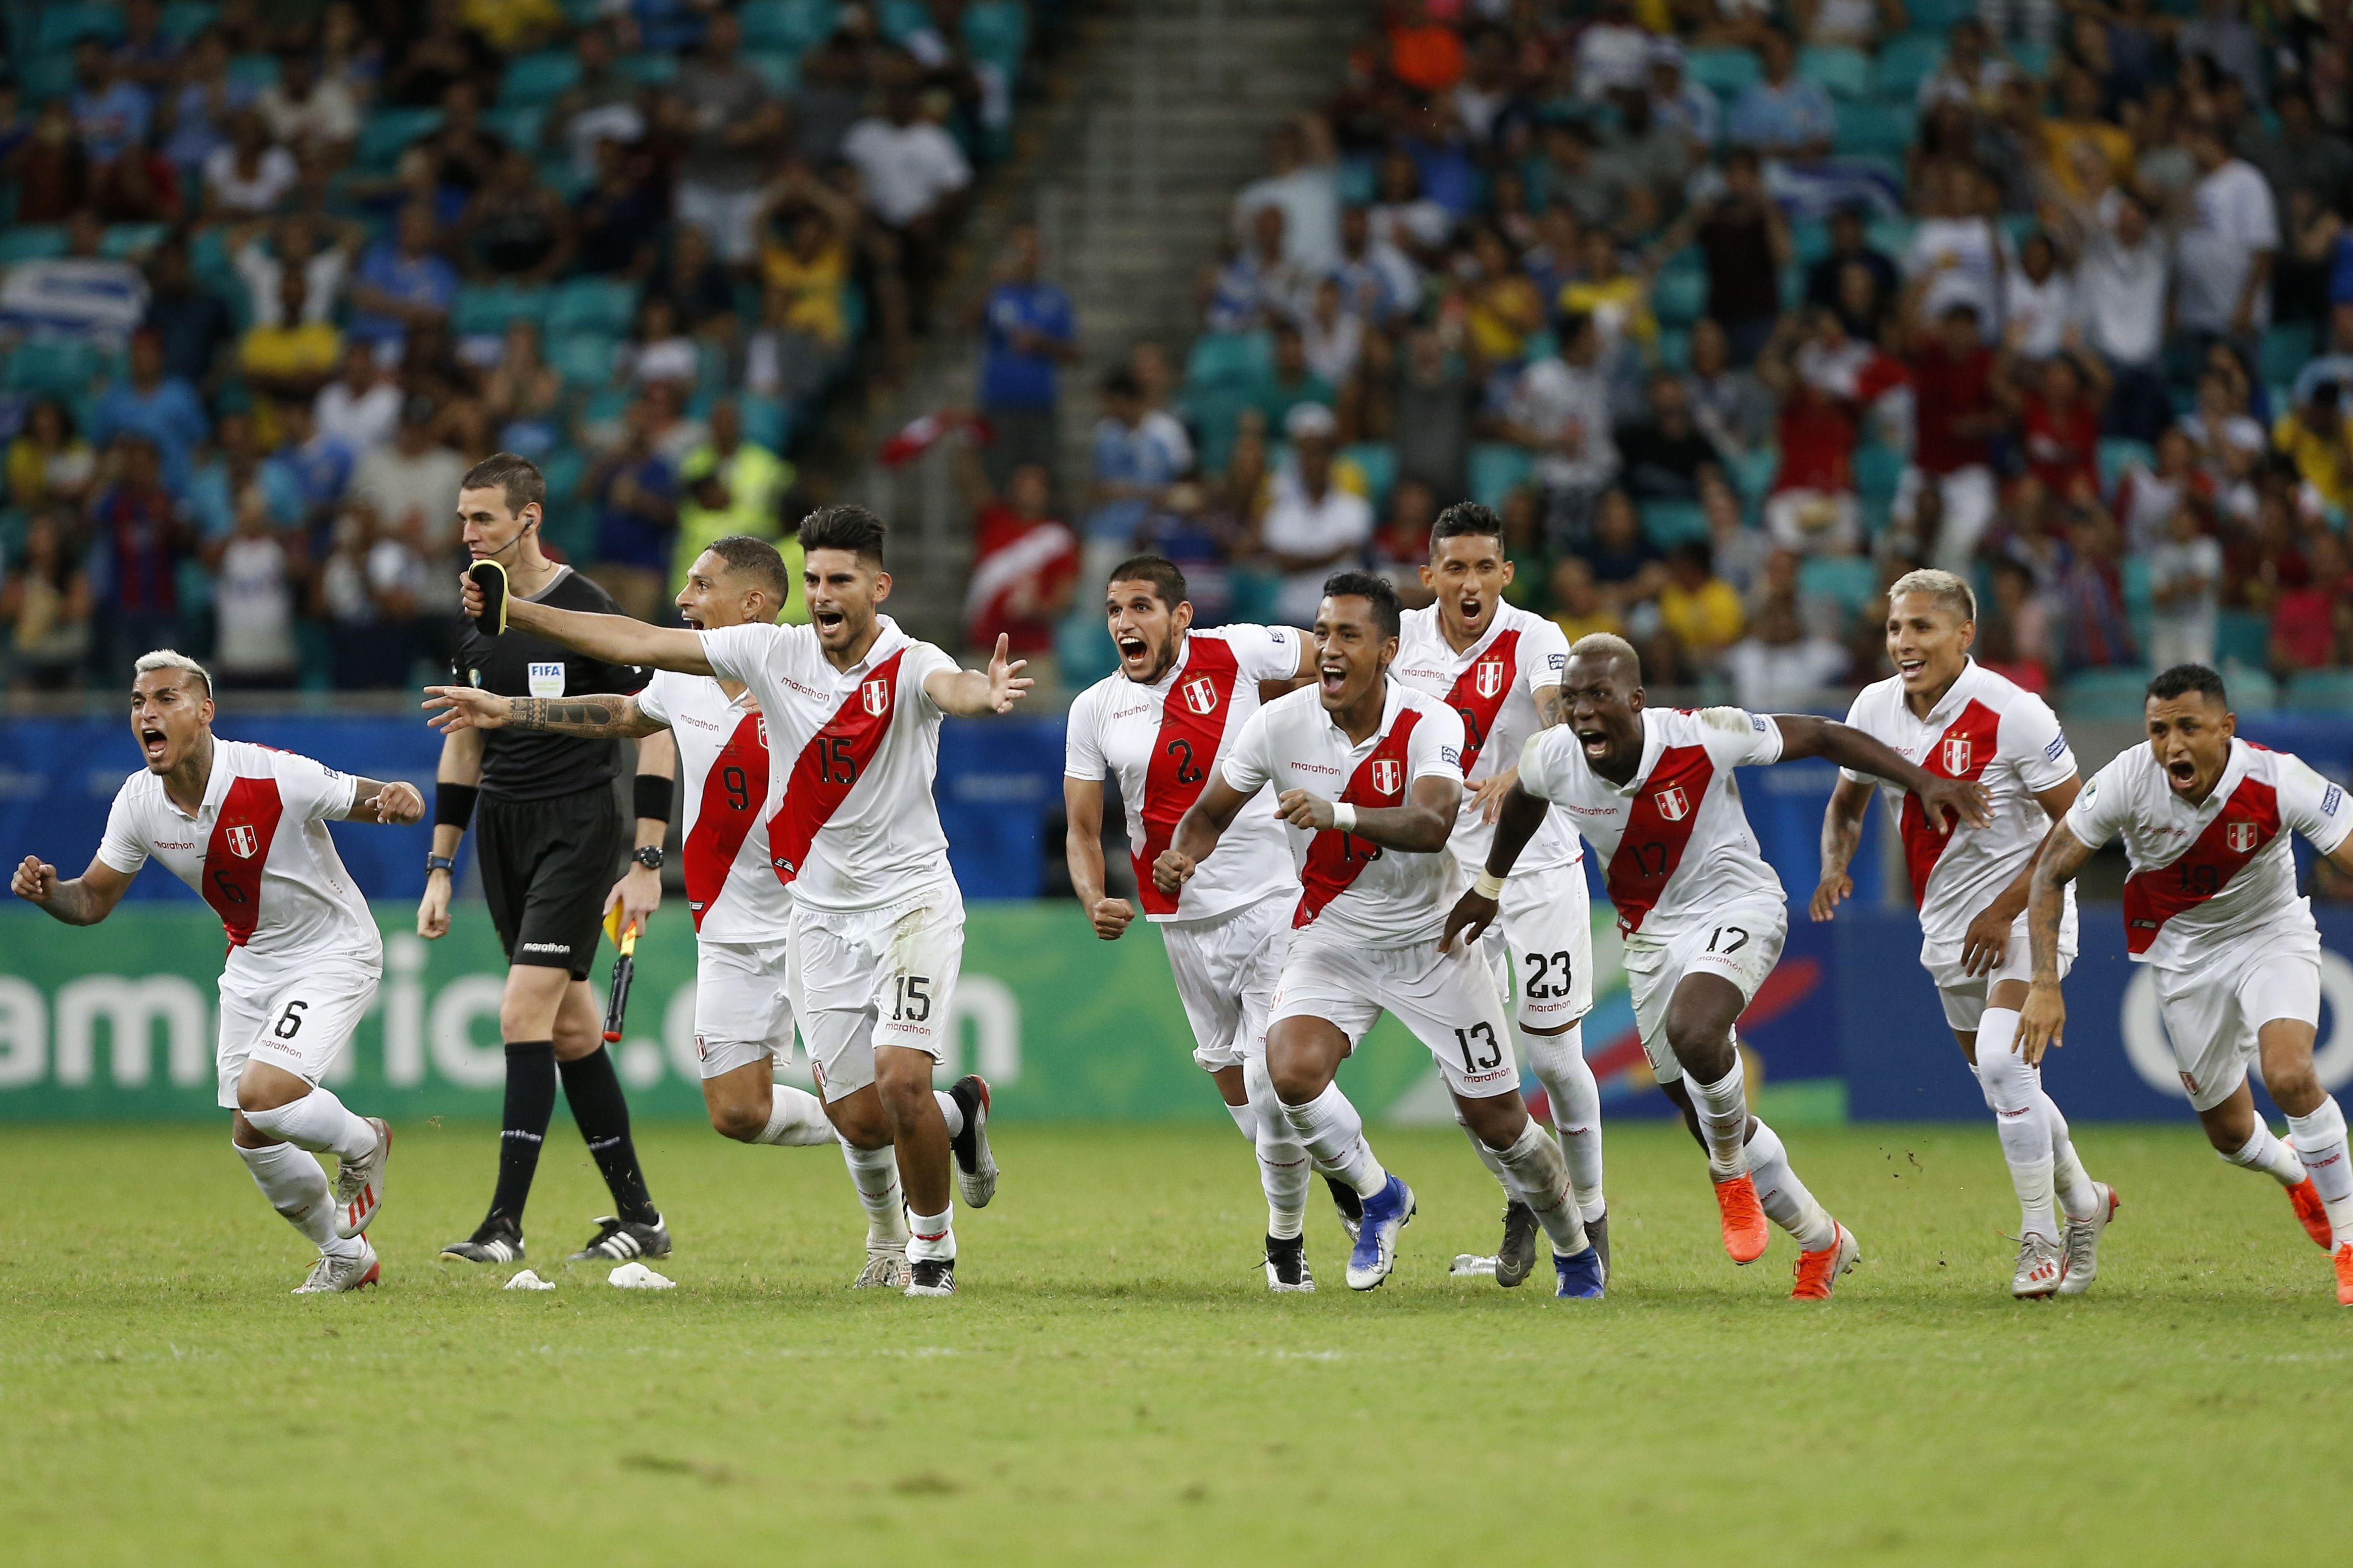 Peru players celebrating the win